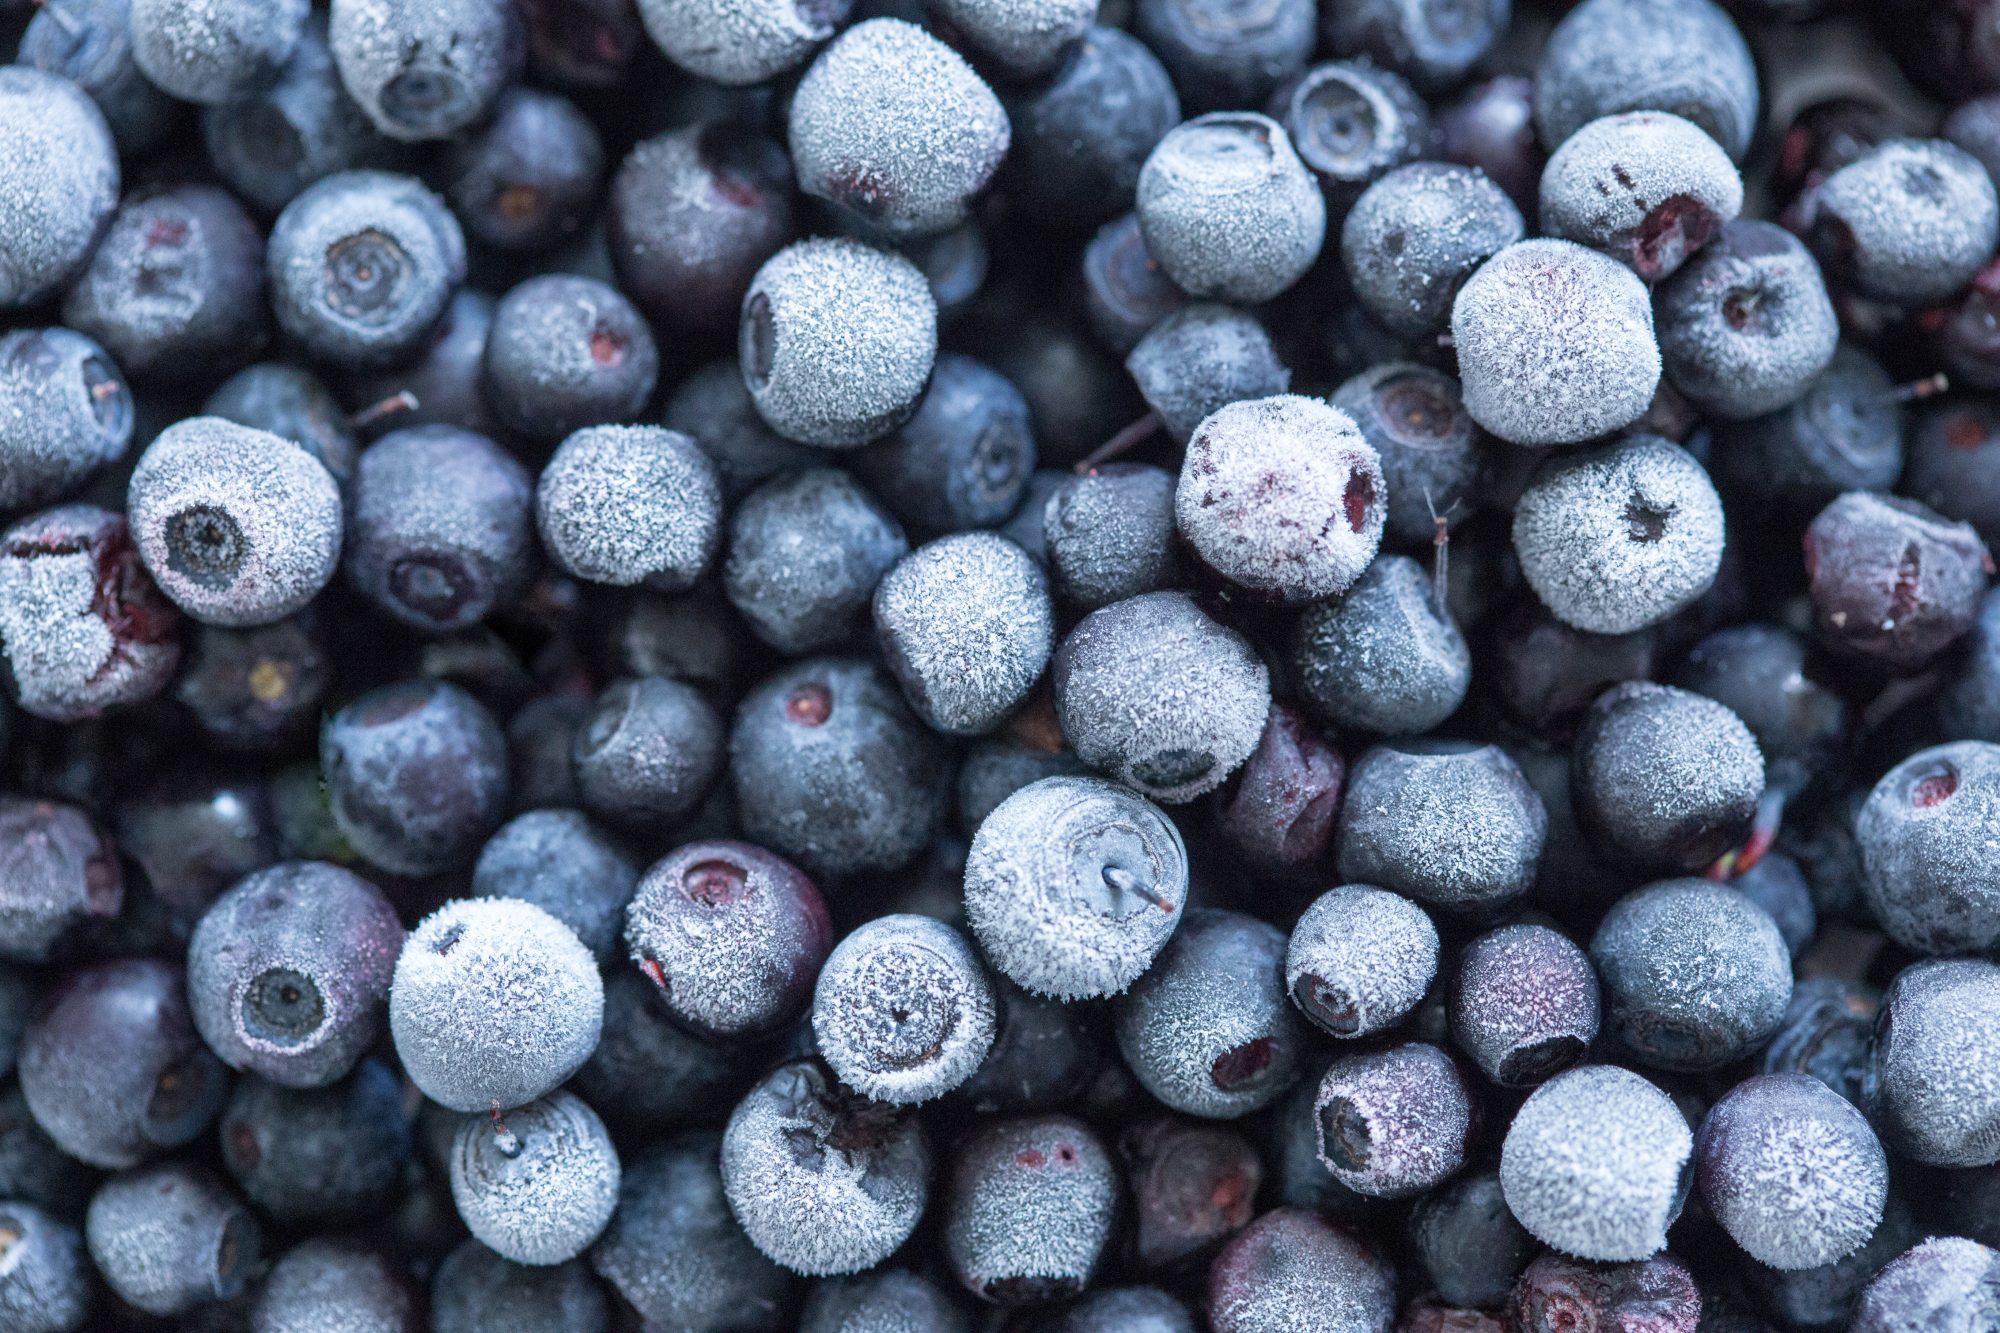 Frozen blueberries Getty 7/16/20